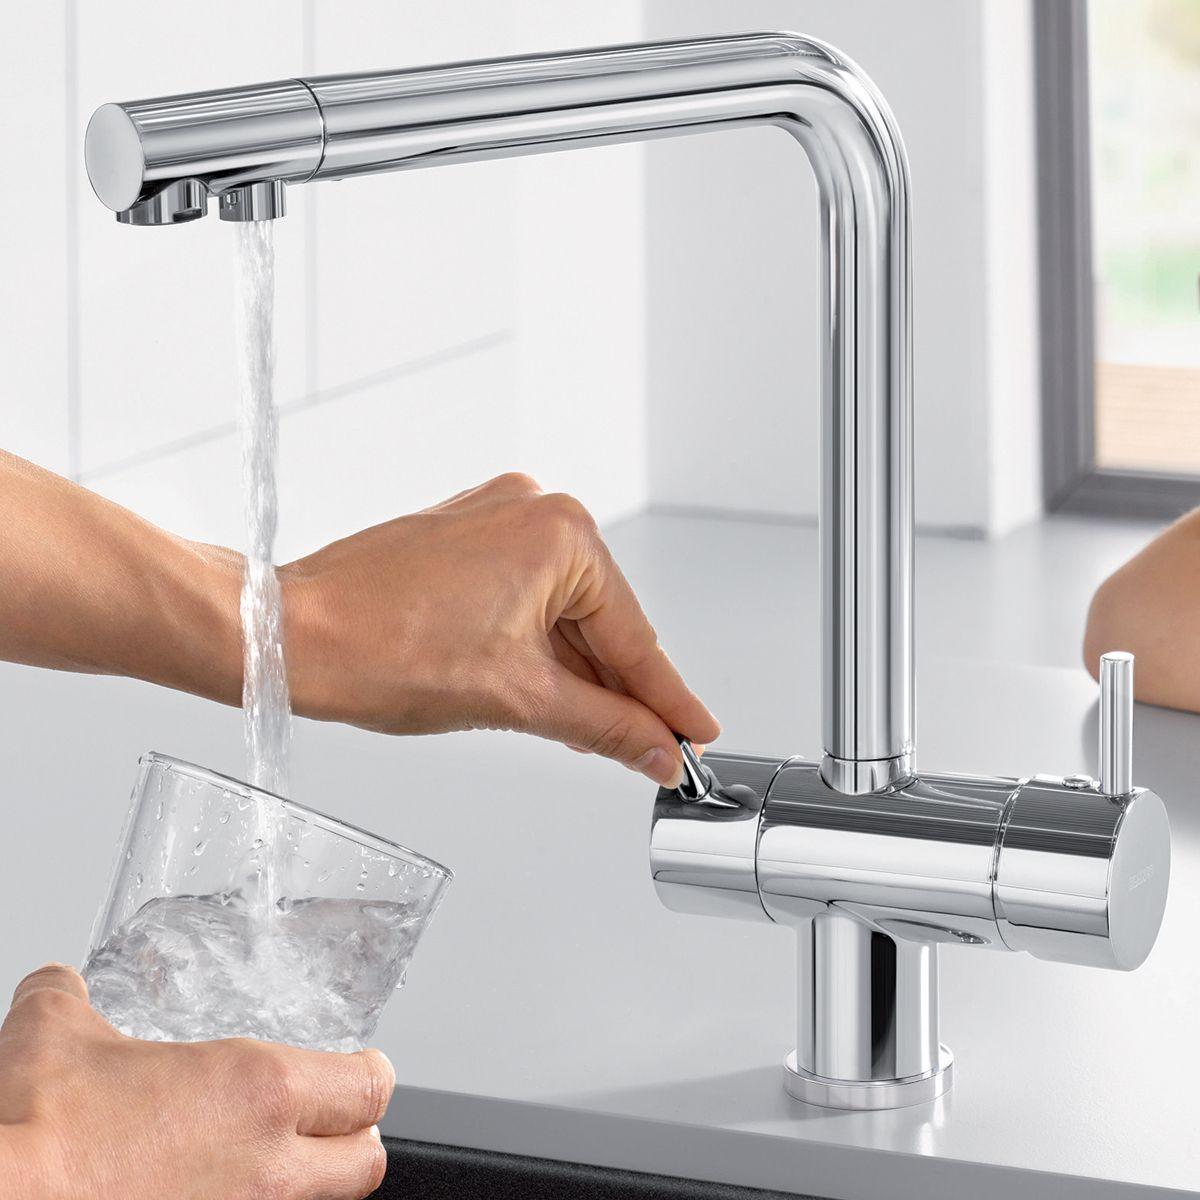 blanco filtra pro kitchen filter tap